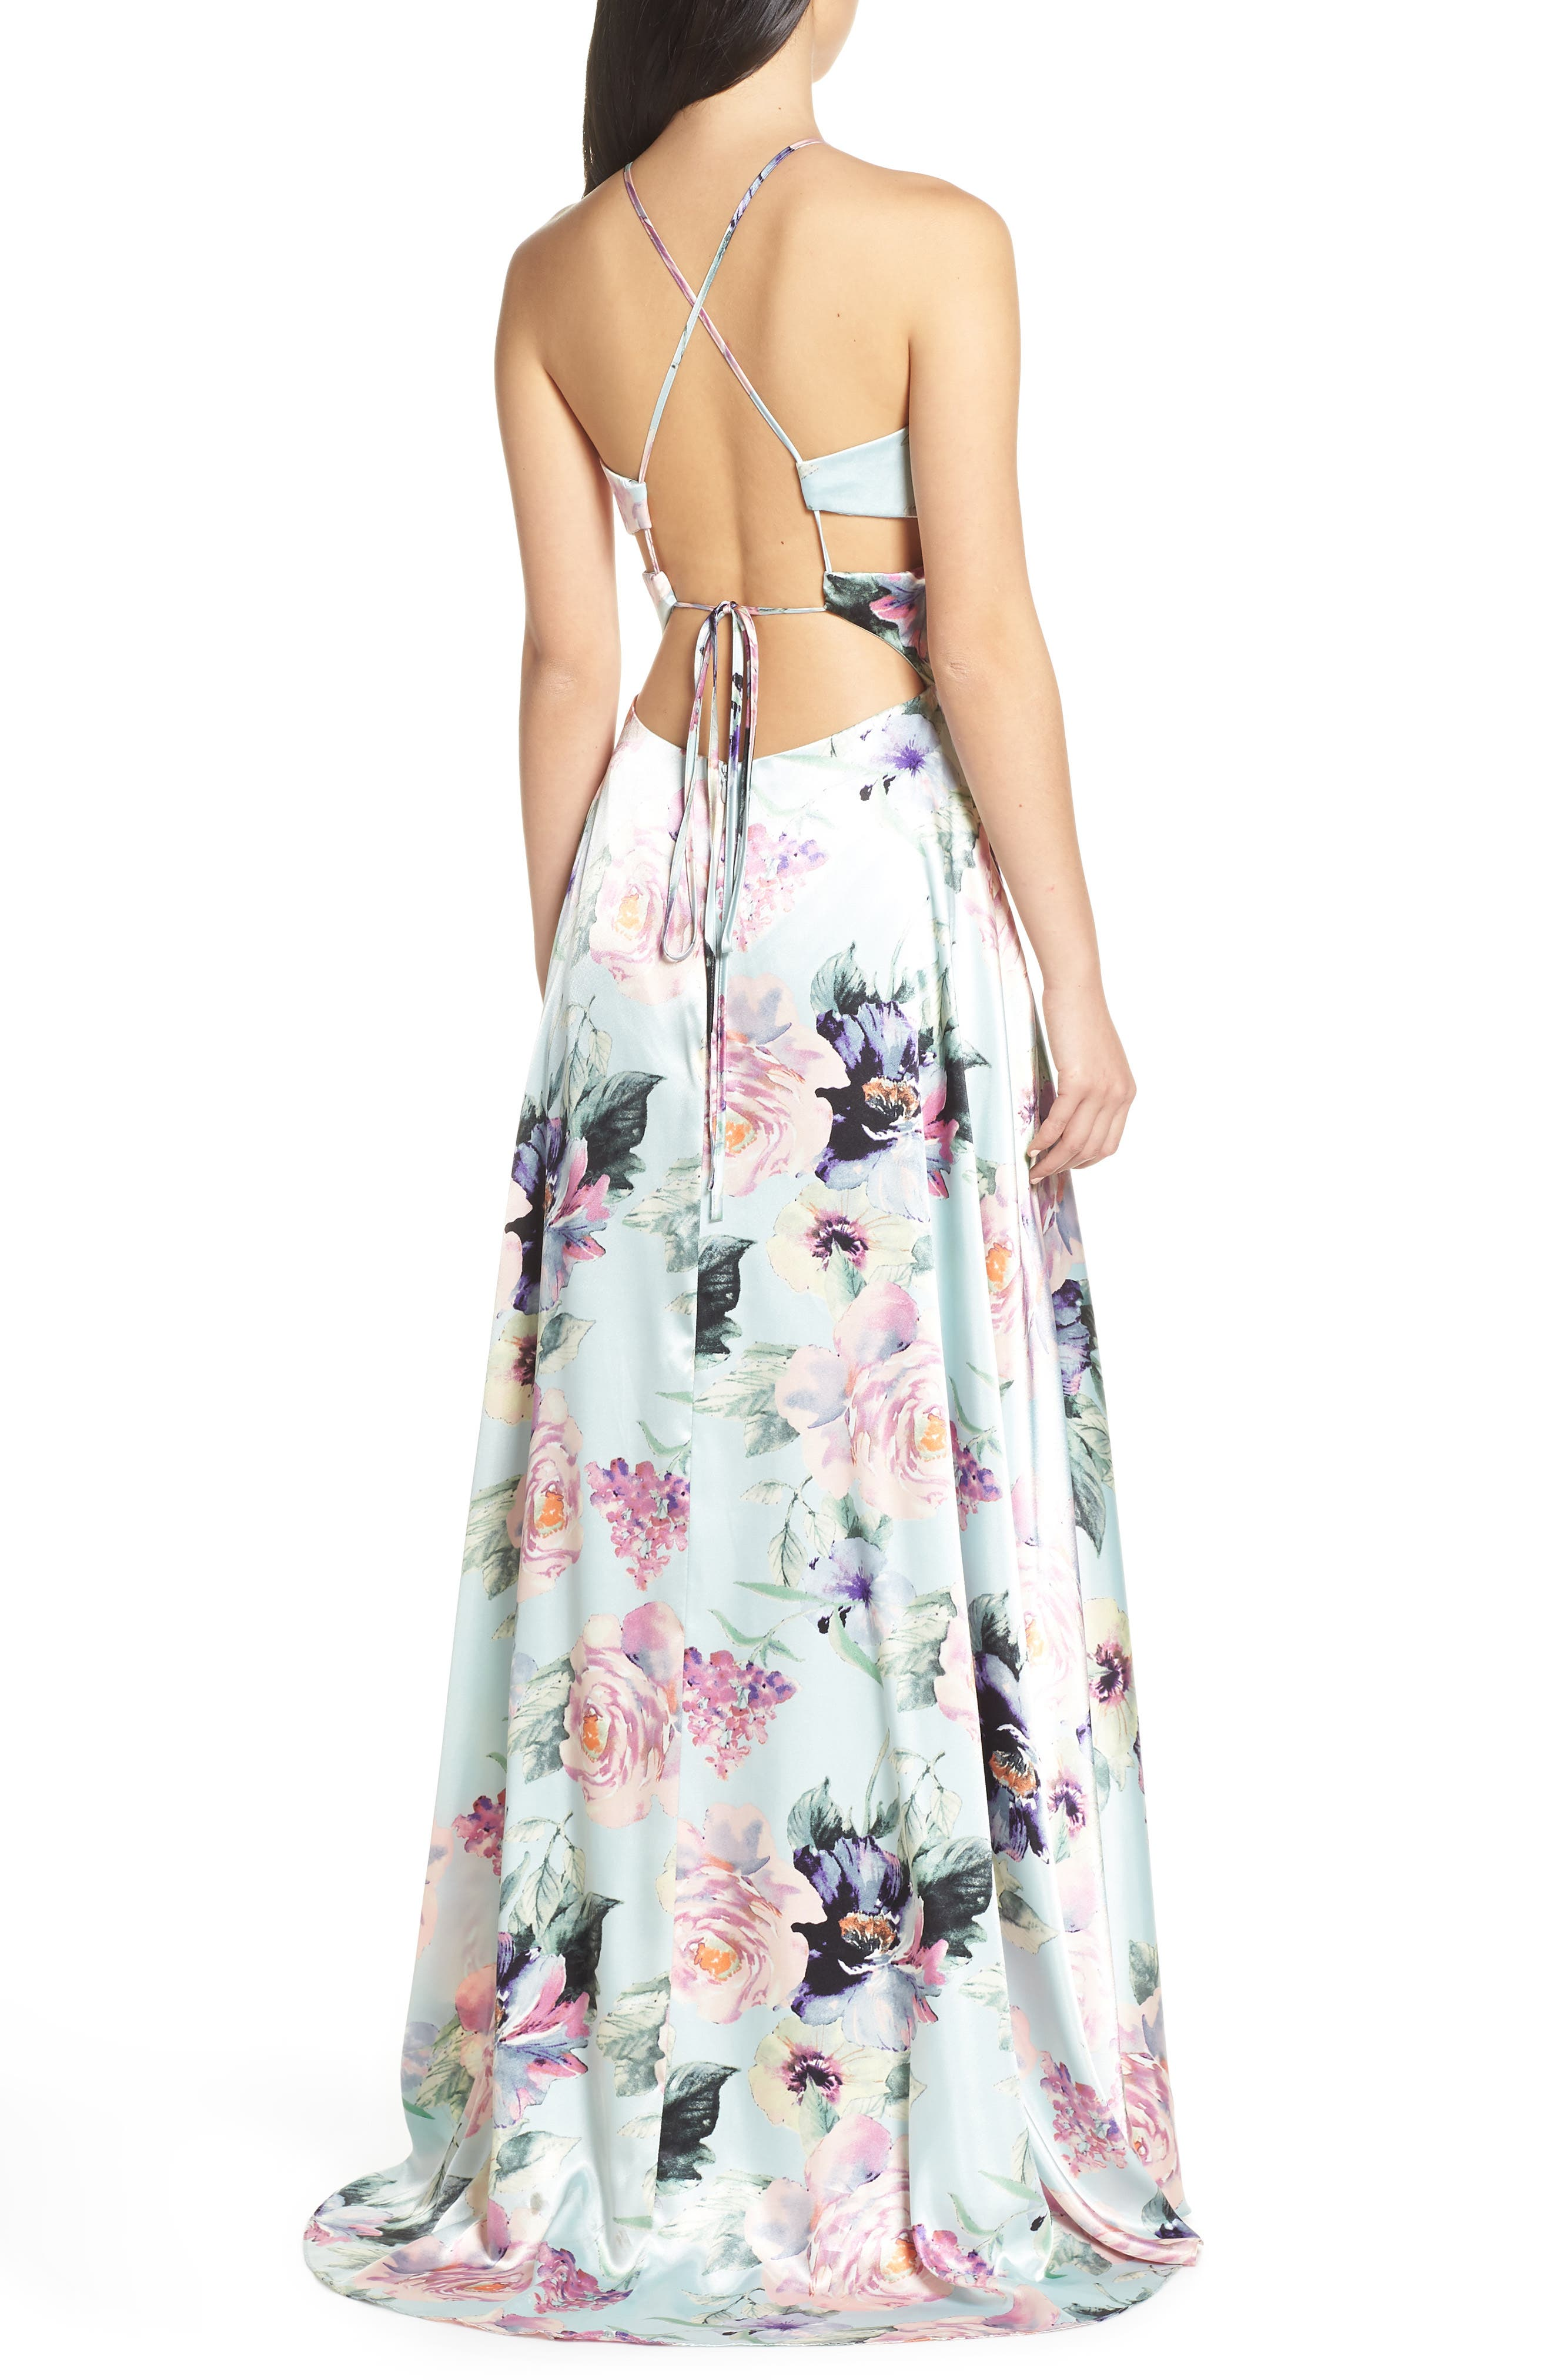 BLONDIE NITES,                             Floral Print Charmeuse Evening Dress,                             Alternate thumbnail 2, color,                             MINT/ MULTI